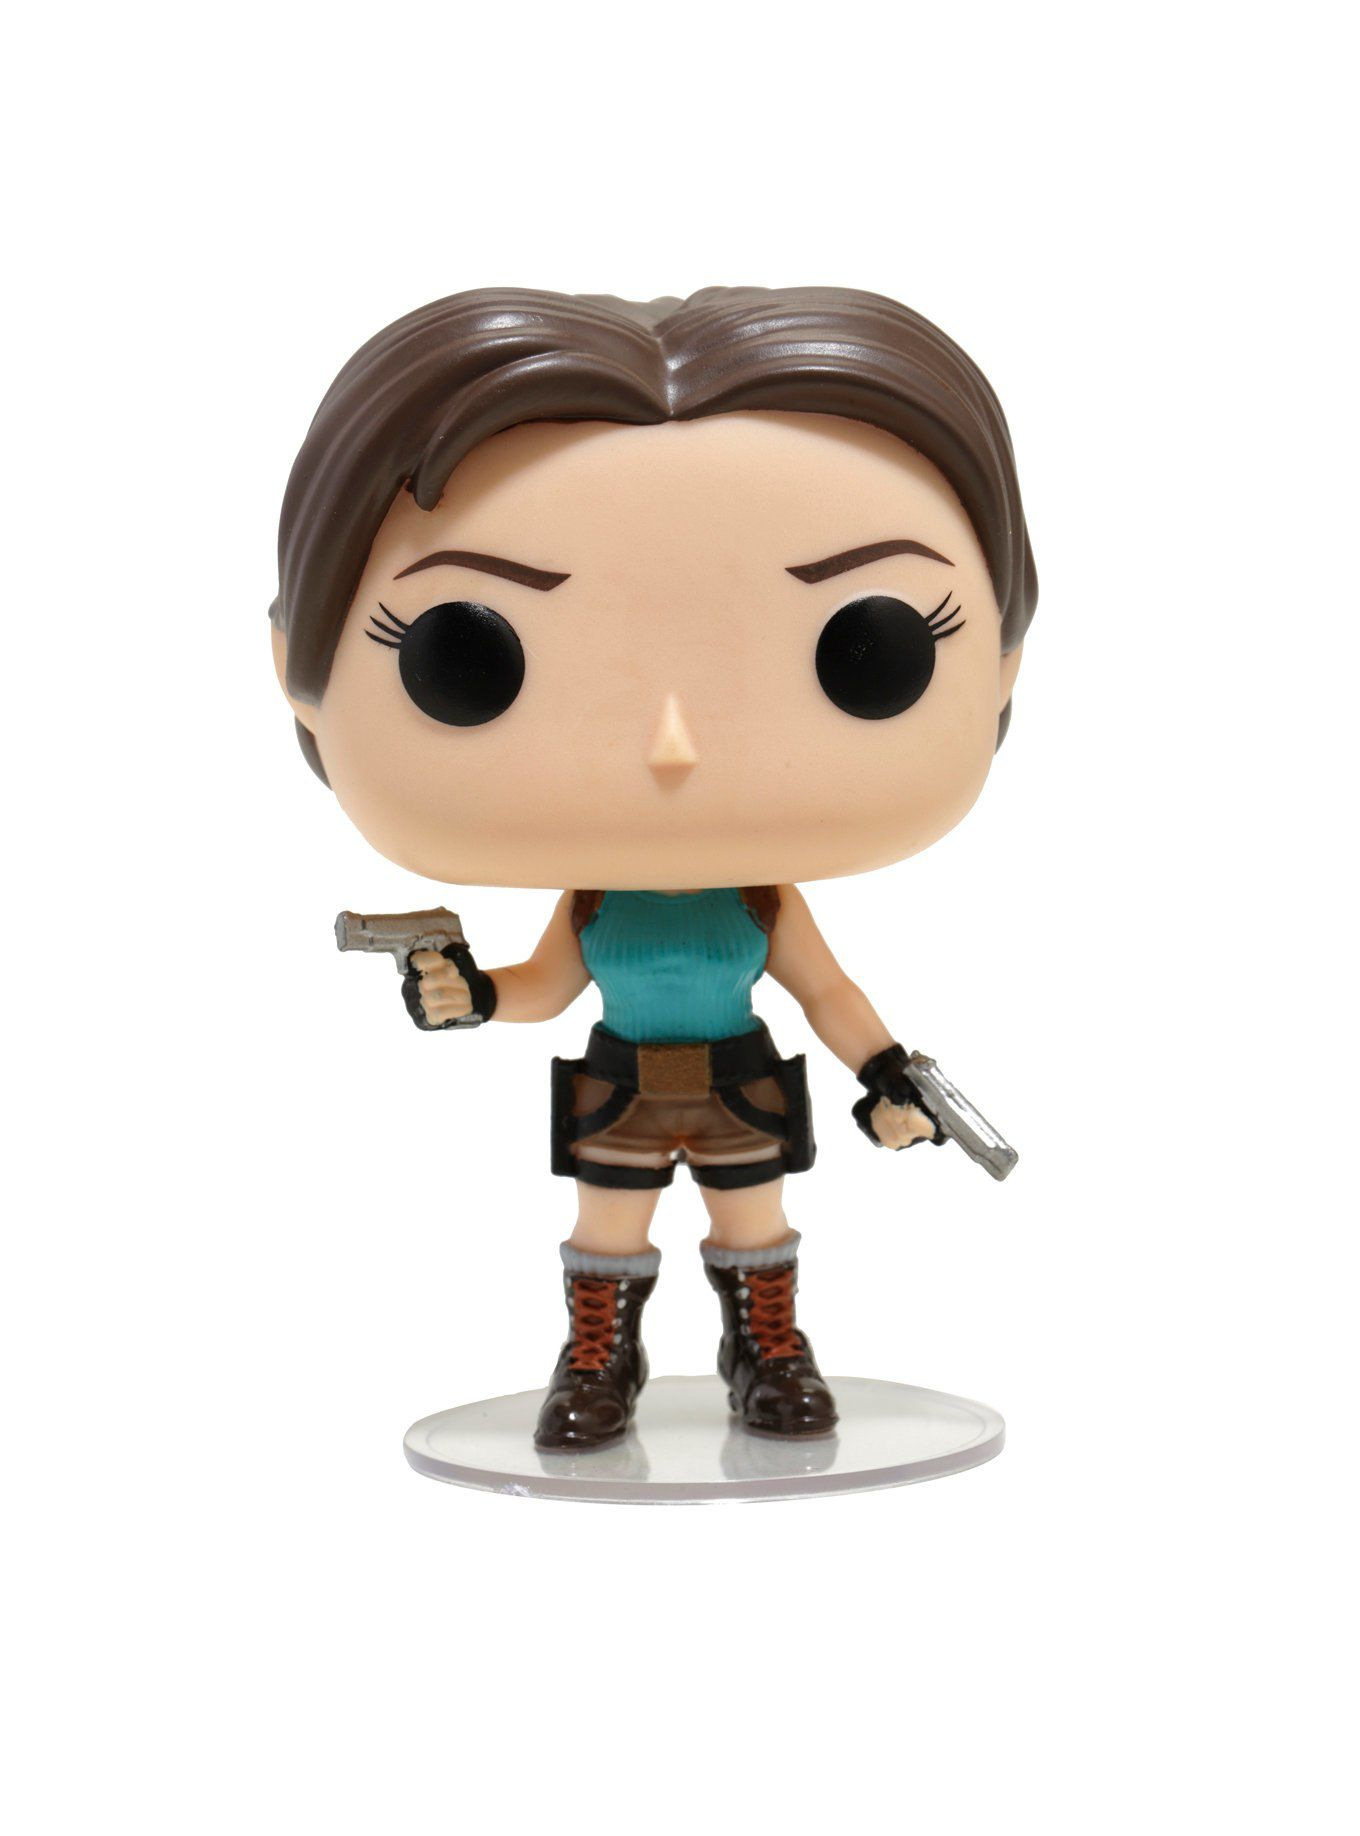 Lara Croft #168 - Tomb Raider - Funko Pop! Games